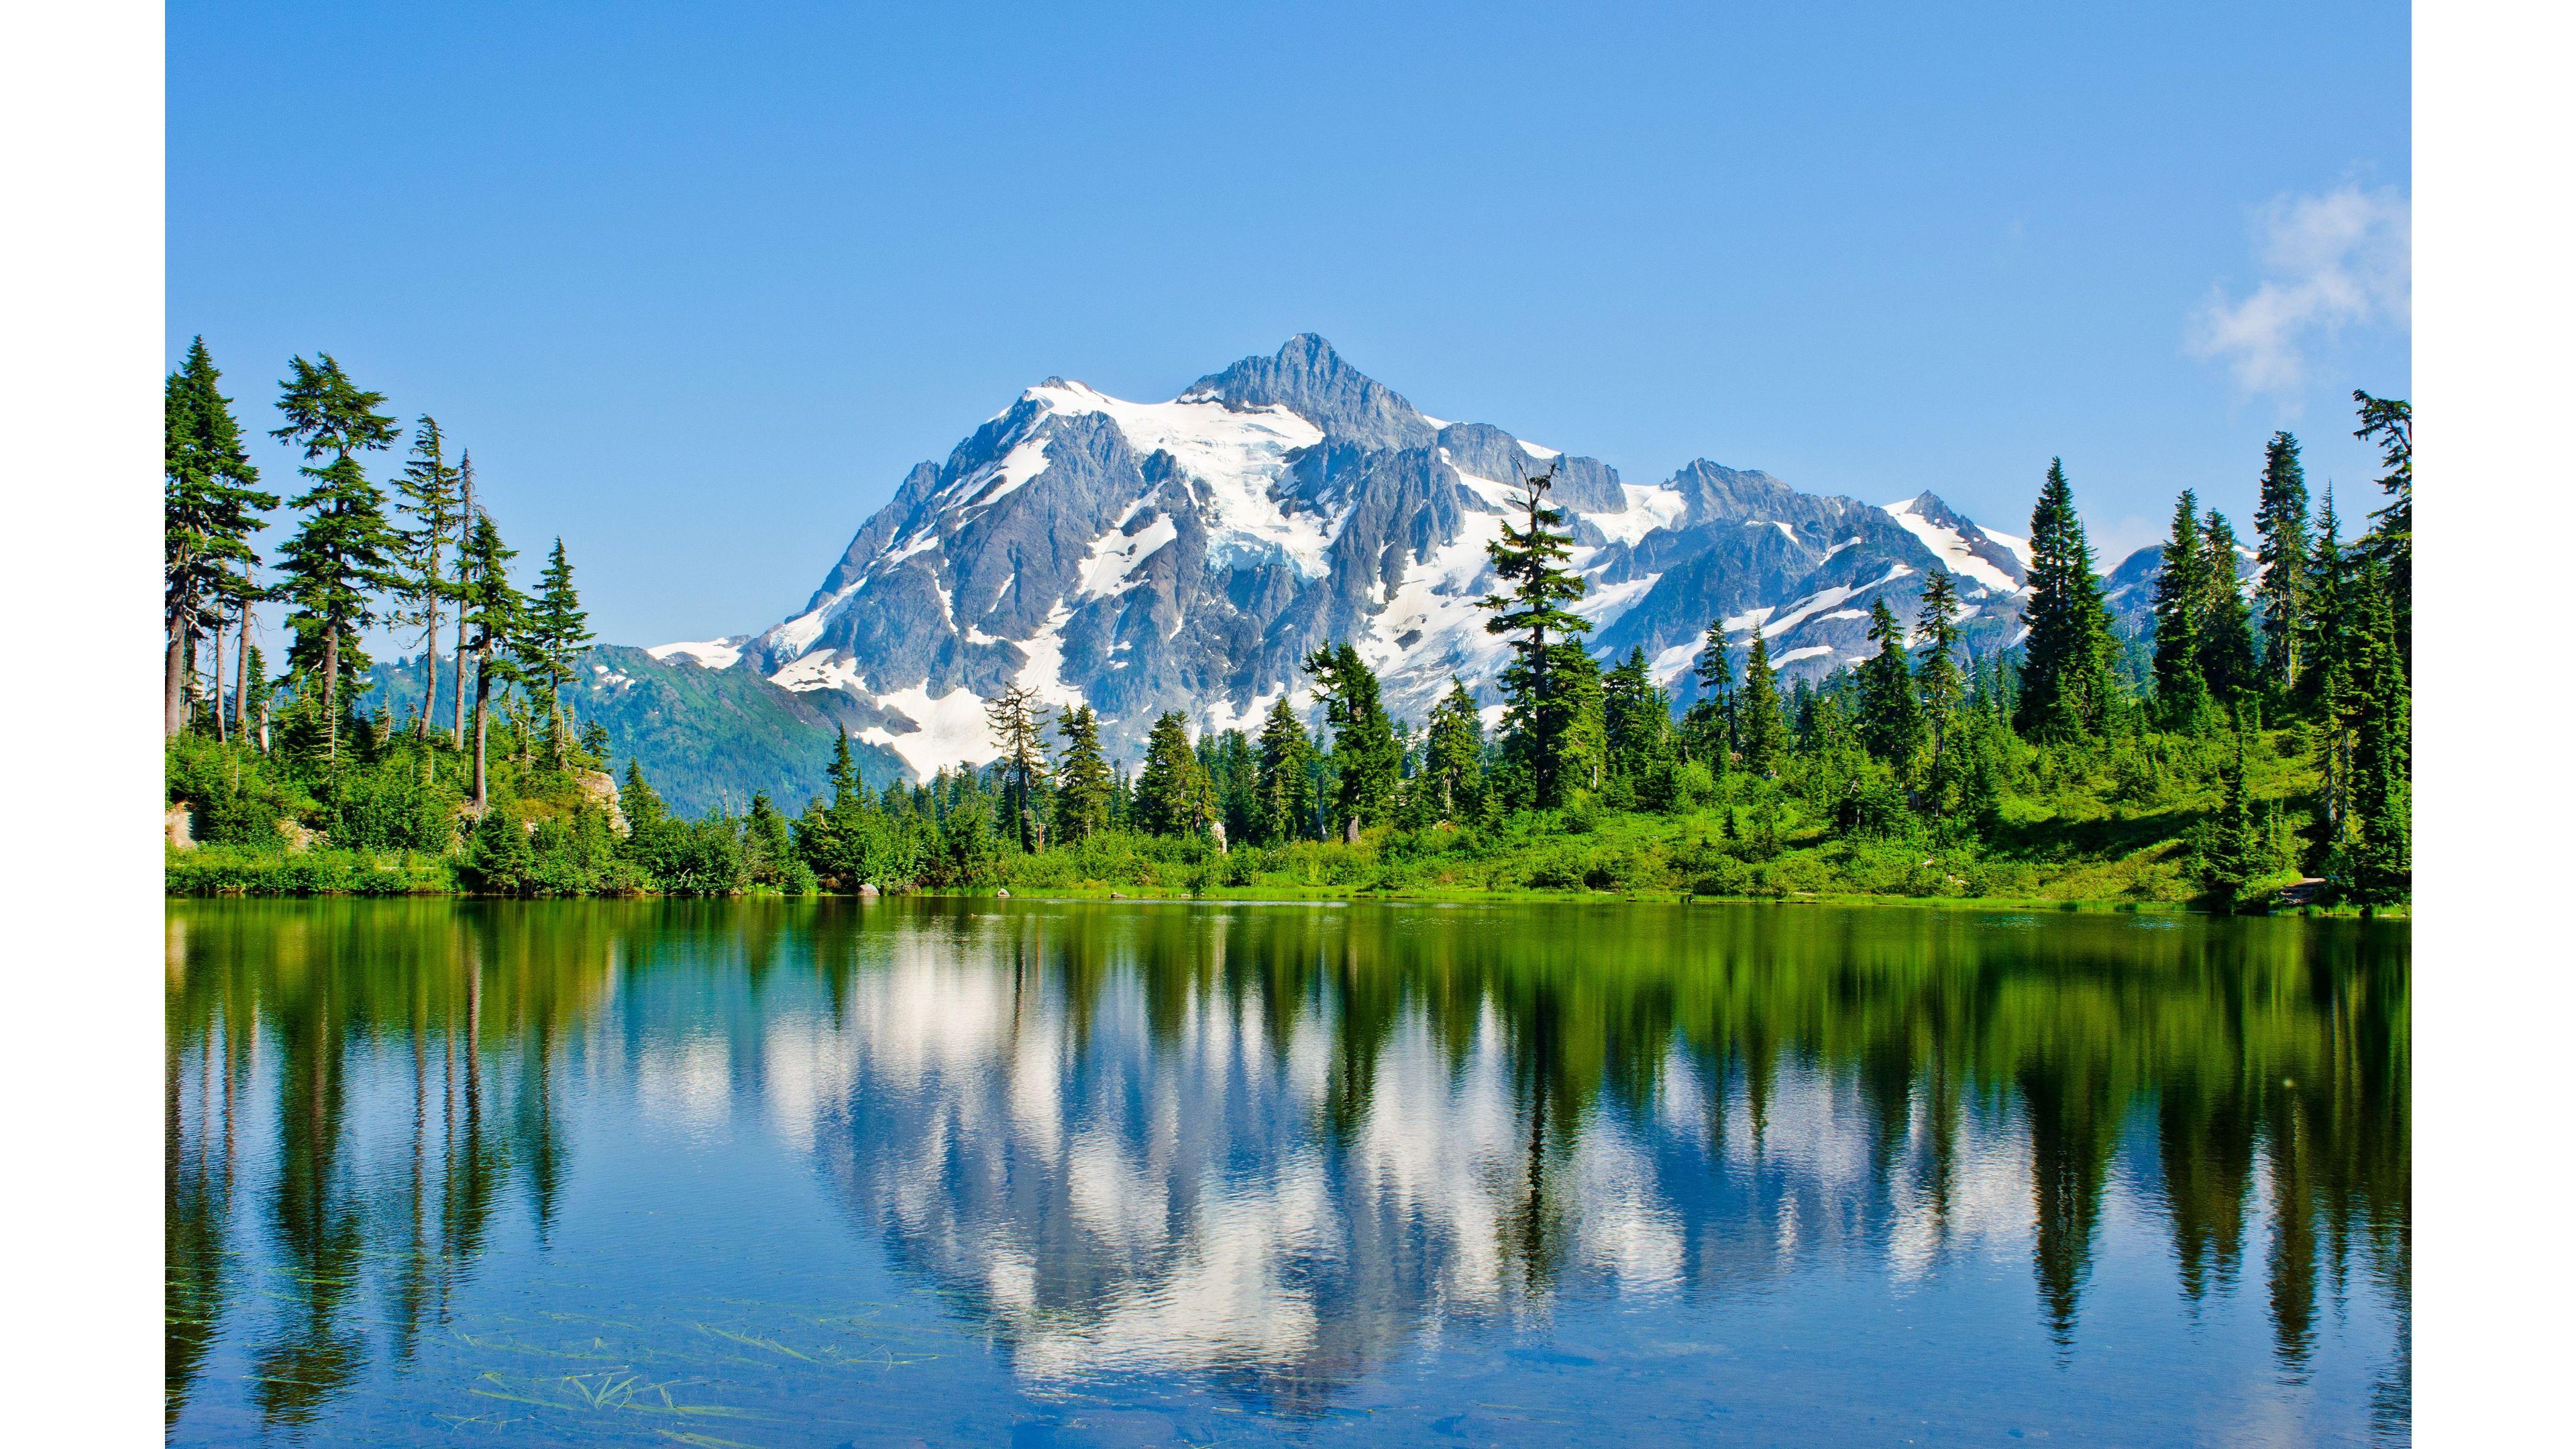 Top Alaska Mountains Wallpaper